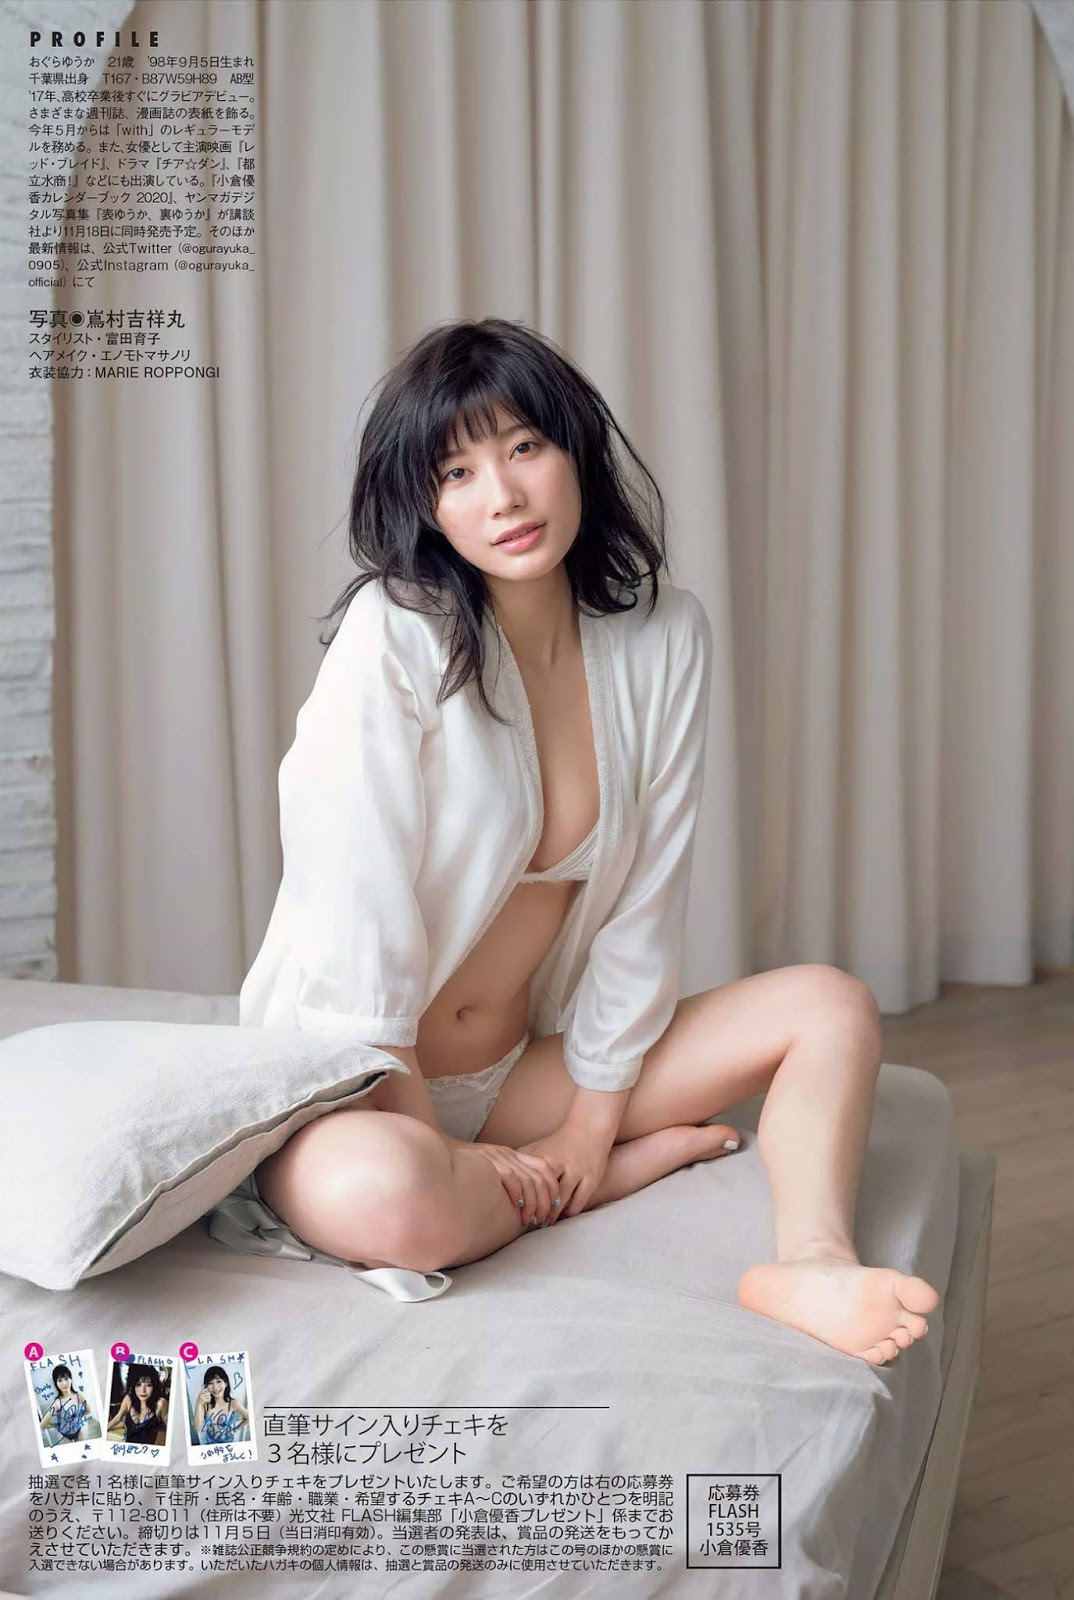 [tsdv-11854] Yuko Ogura 小倉優子 小倉優子の片思いグラフティ 小倉優子 [dvd]